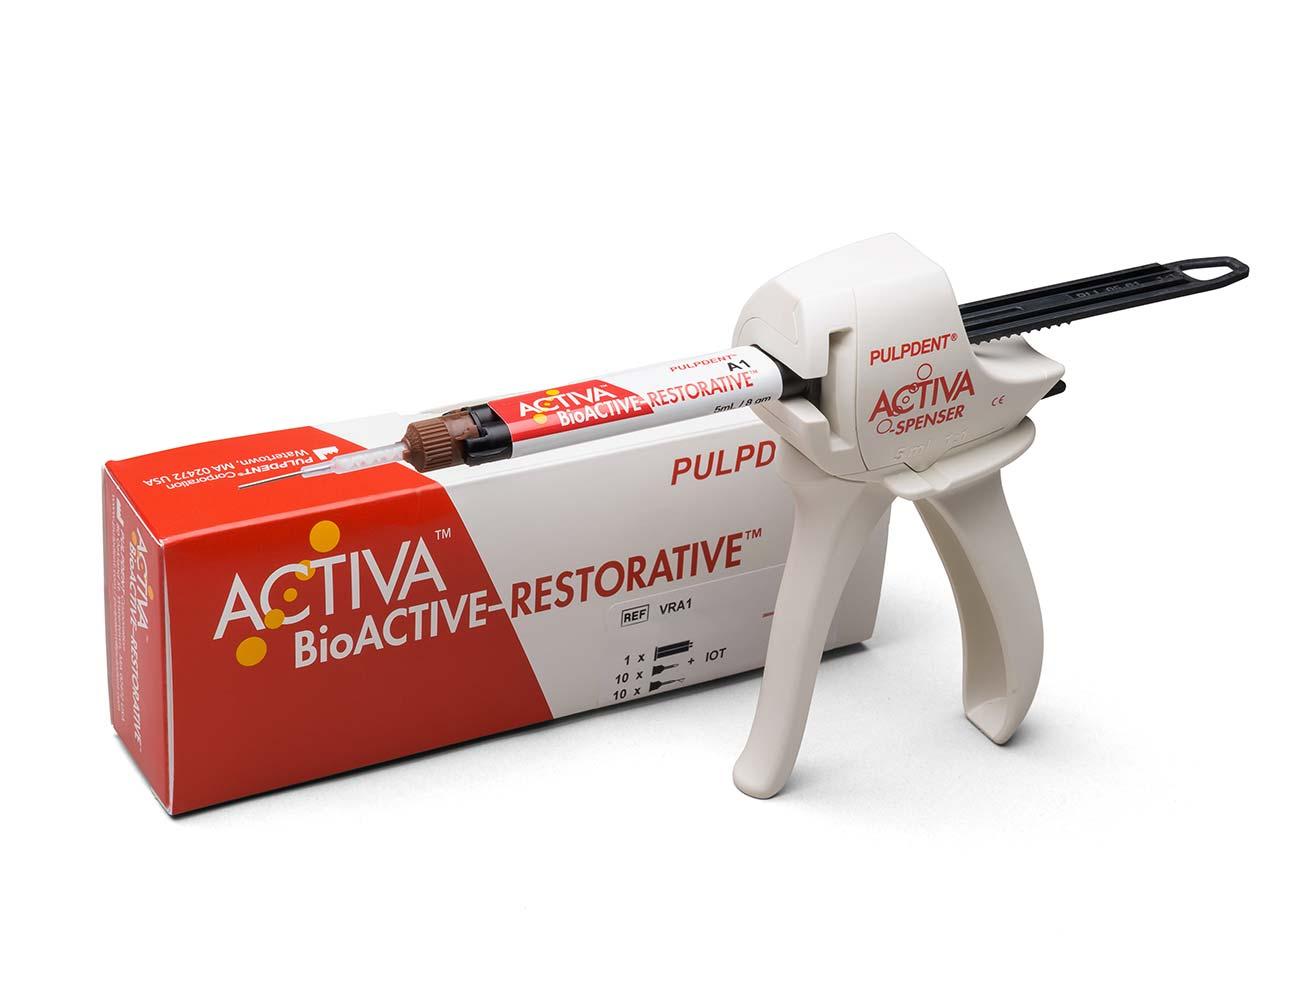 ACTIVA BioACTIVE – RESTORATIVE